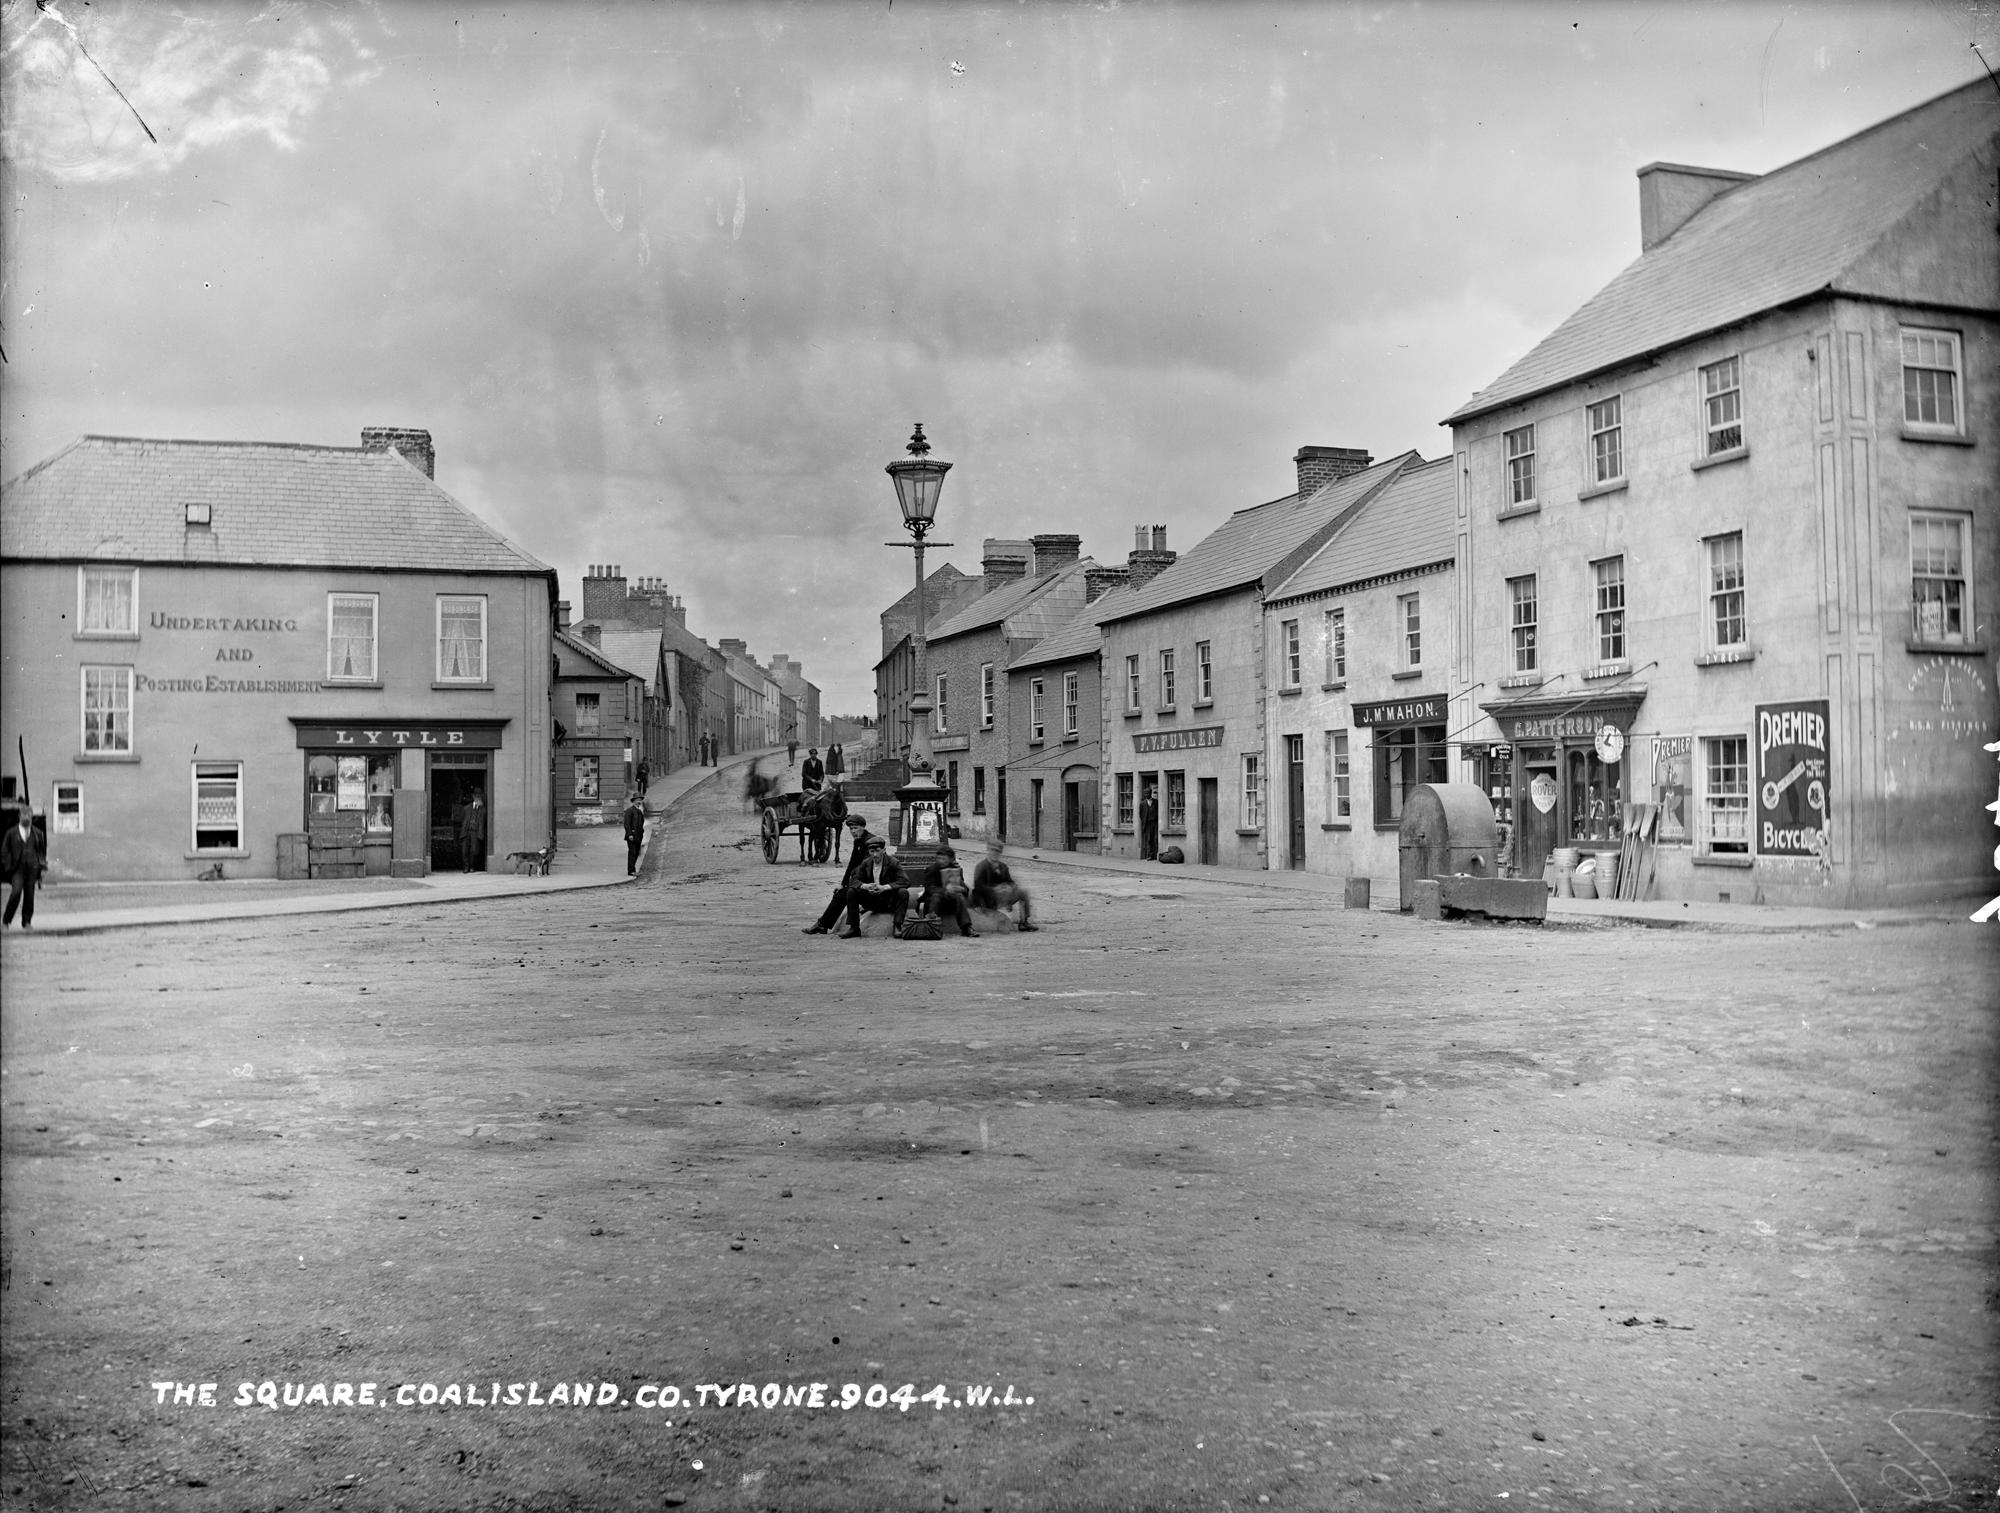 Square, Coalisland, Co. Tyrone